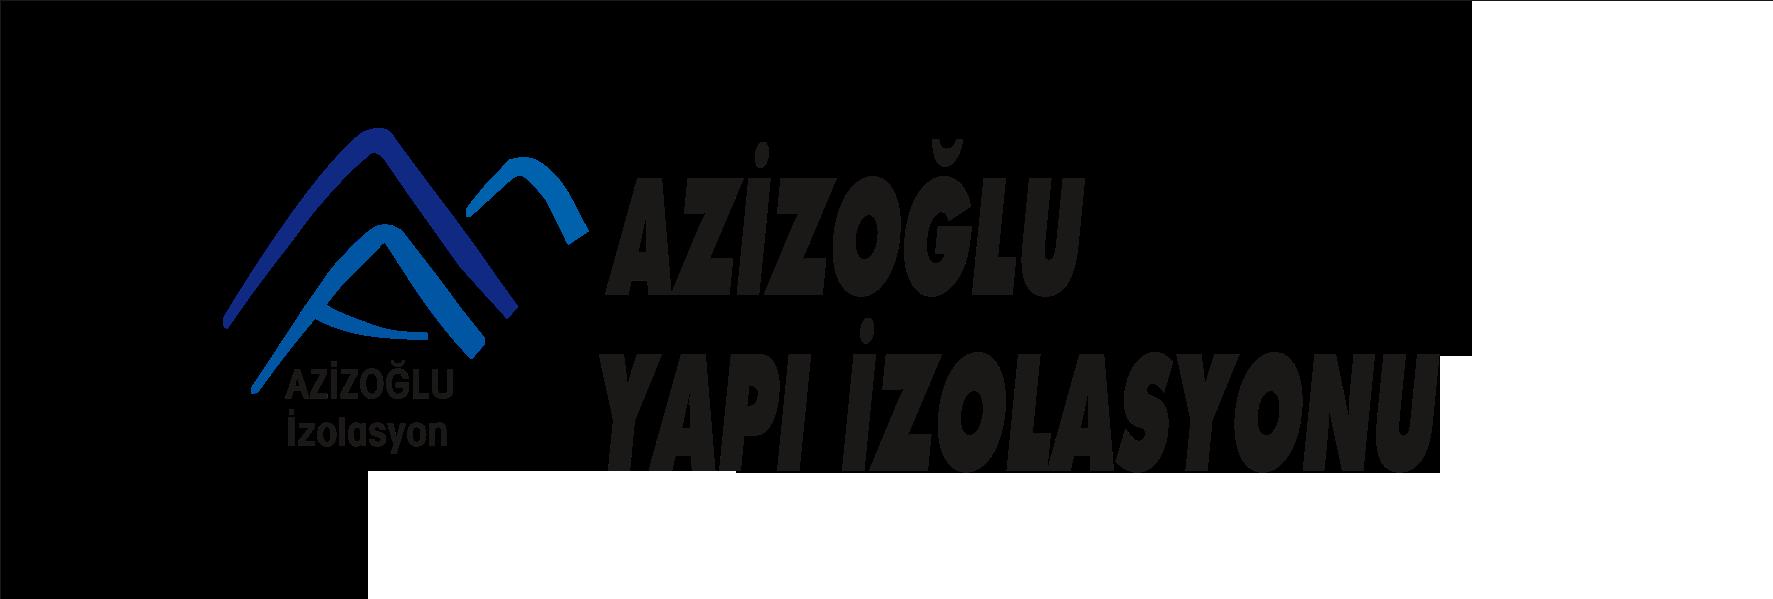 Azizoğlu Yapı İnşaat San. Tic.Ltd. Şti. Yalıtım İzolasyon- Ankara